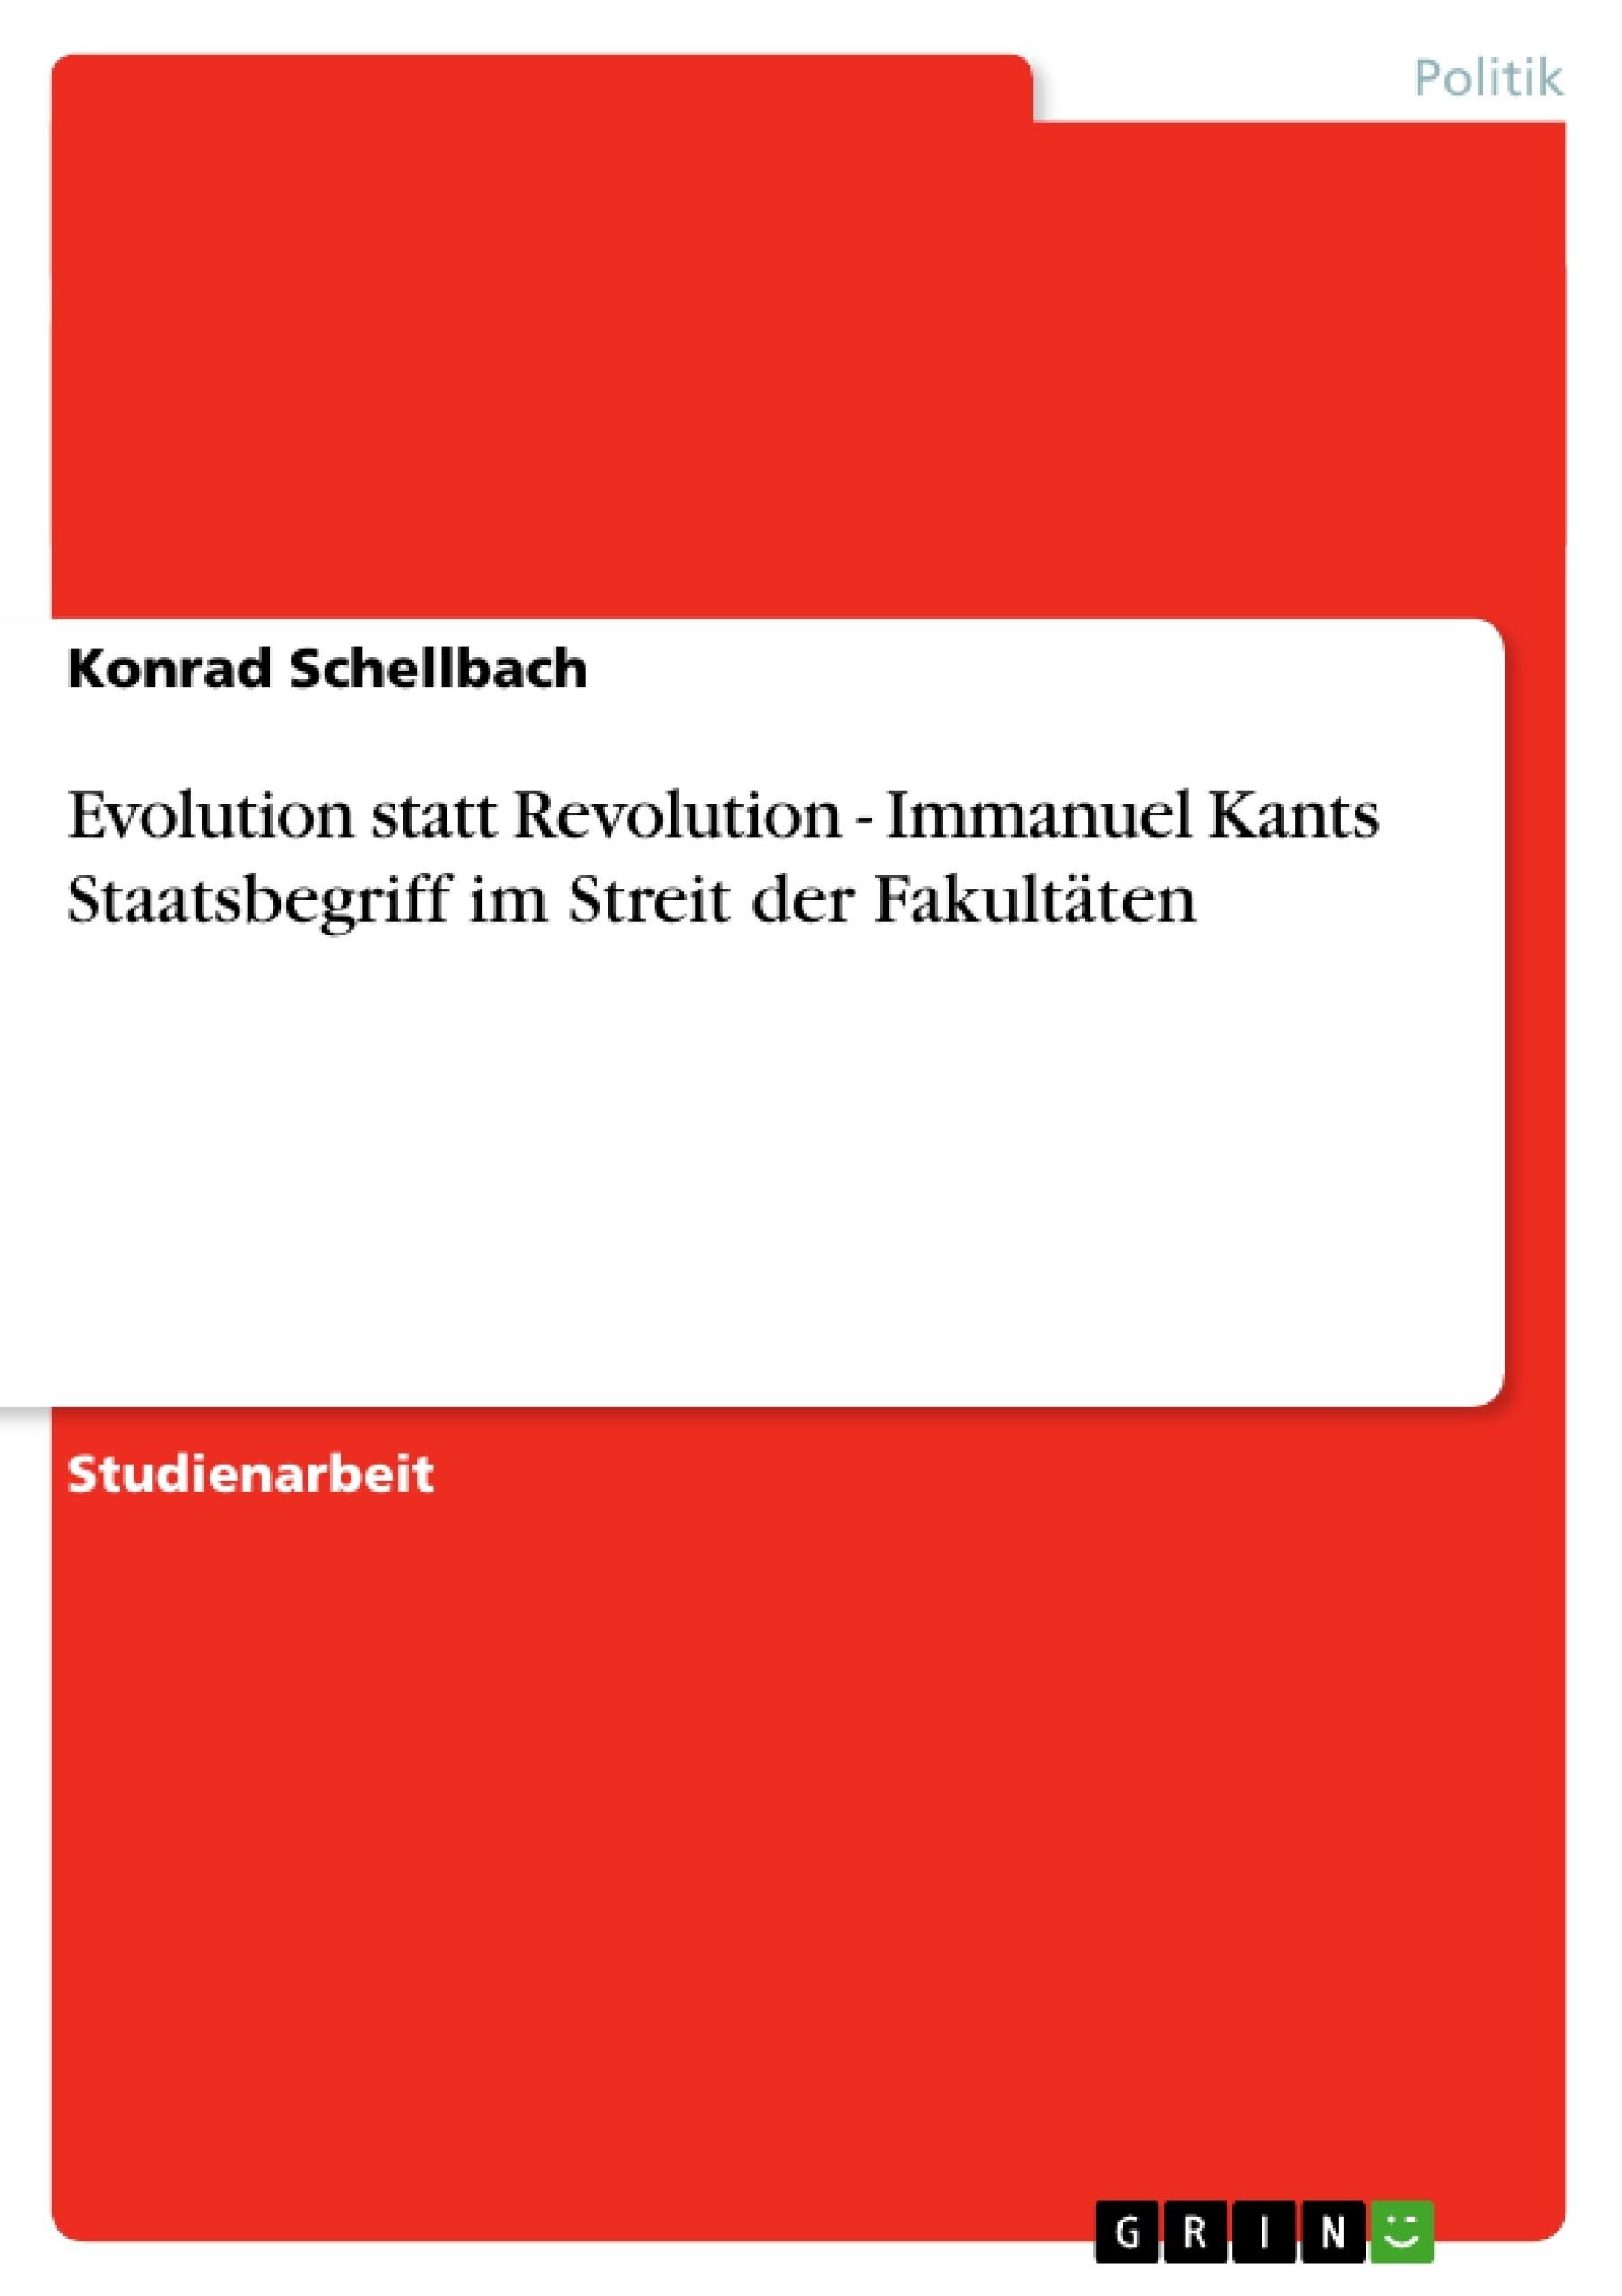 Titel: Evolution statt Revolution - Immanuel Kants Staatsbegriff im Streit der Fakultäten